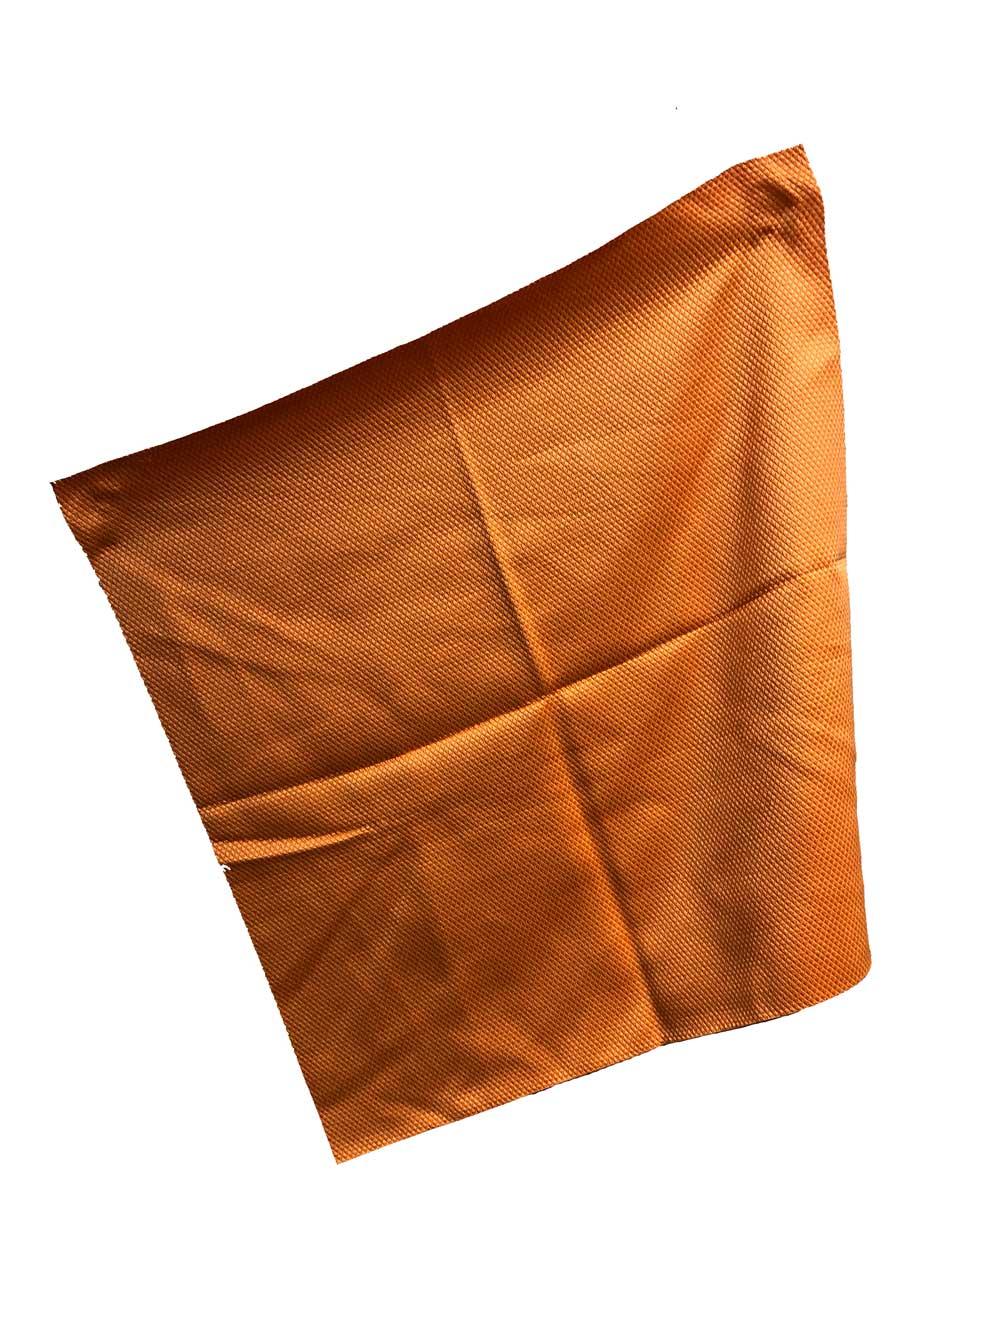 Orange-Mf-duk